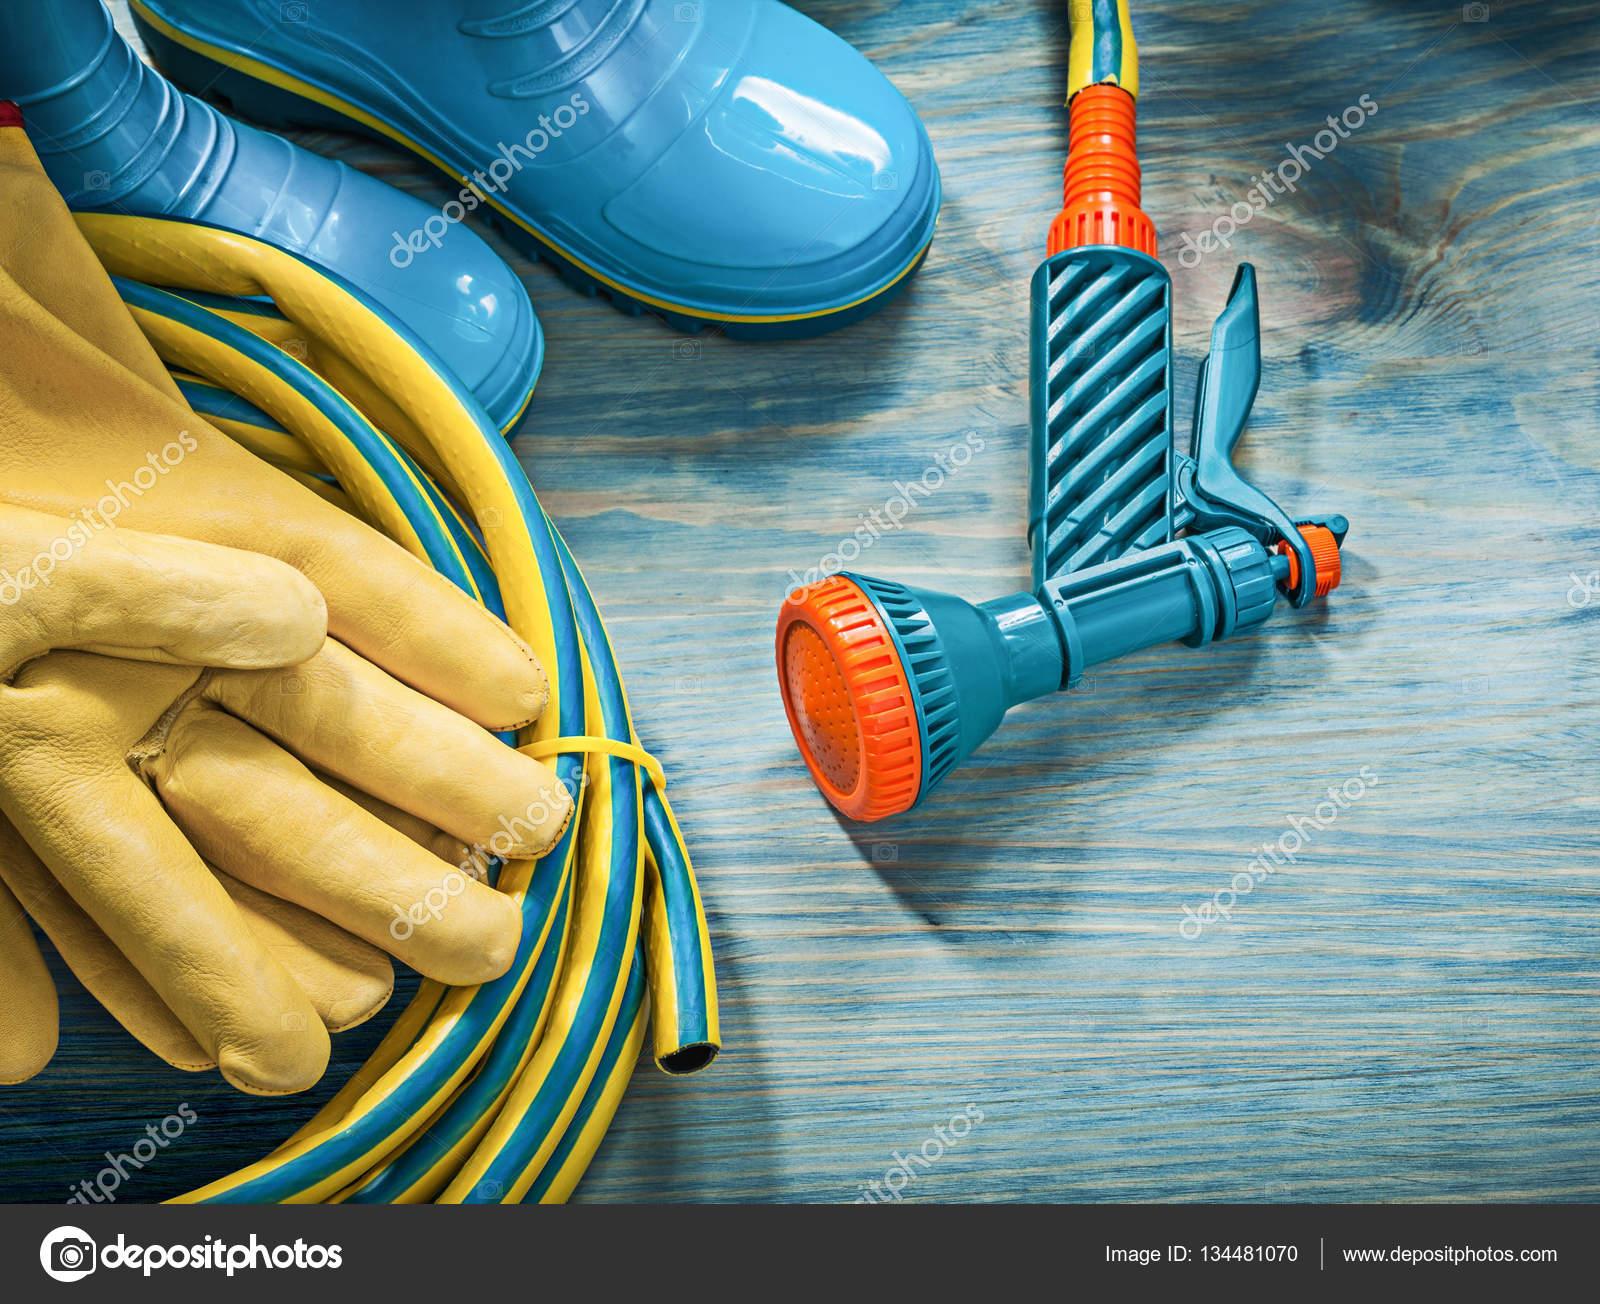 e6cd1702c25 Αδιάβροχο καουτσούκ μπότες με προστατευτικά γάντια και μάνικα κήπων, την ξύλινη  σανίδα, κηπουρική έννοια — Εικόνα από mihalec